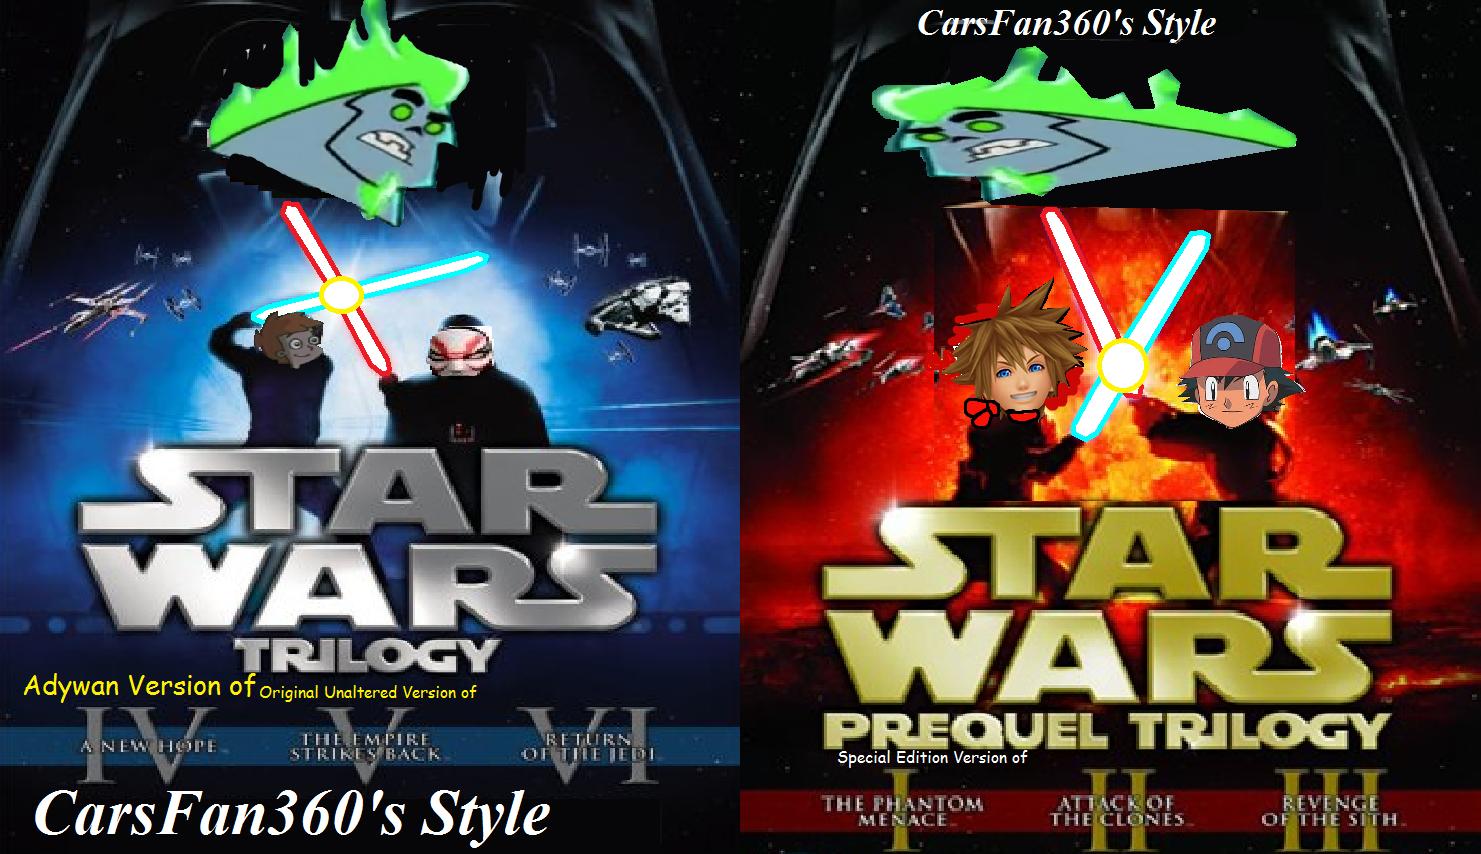 Star Wars (CarsFan360's Style)